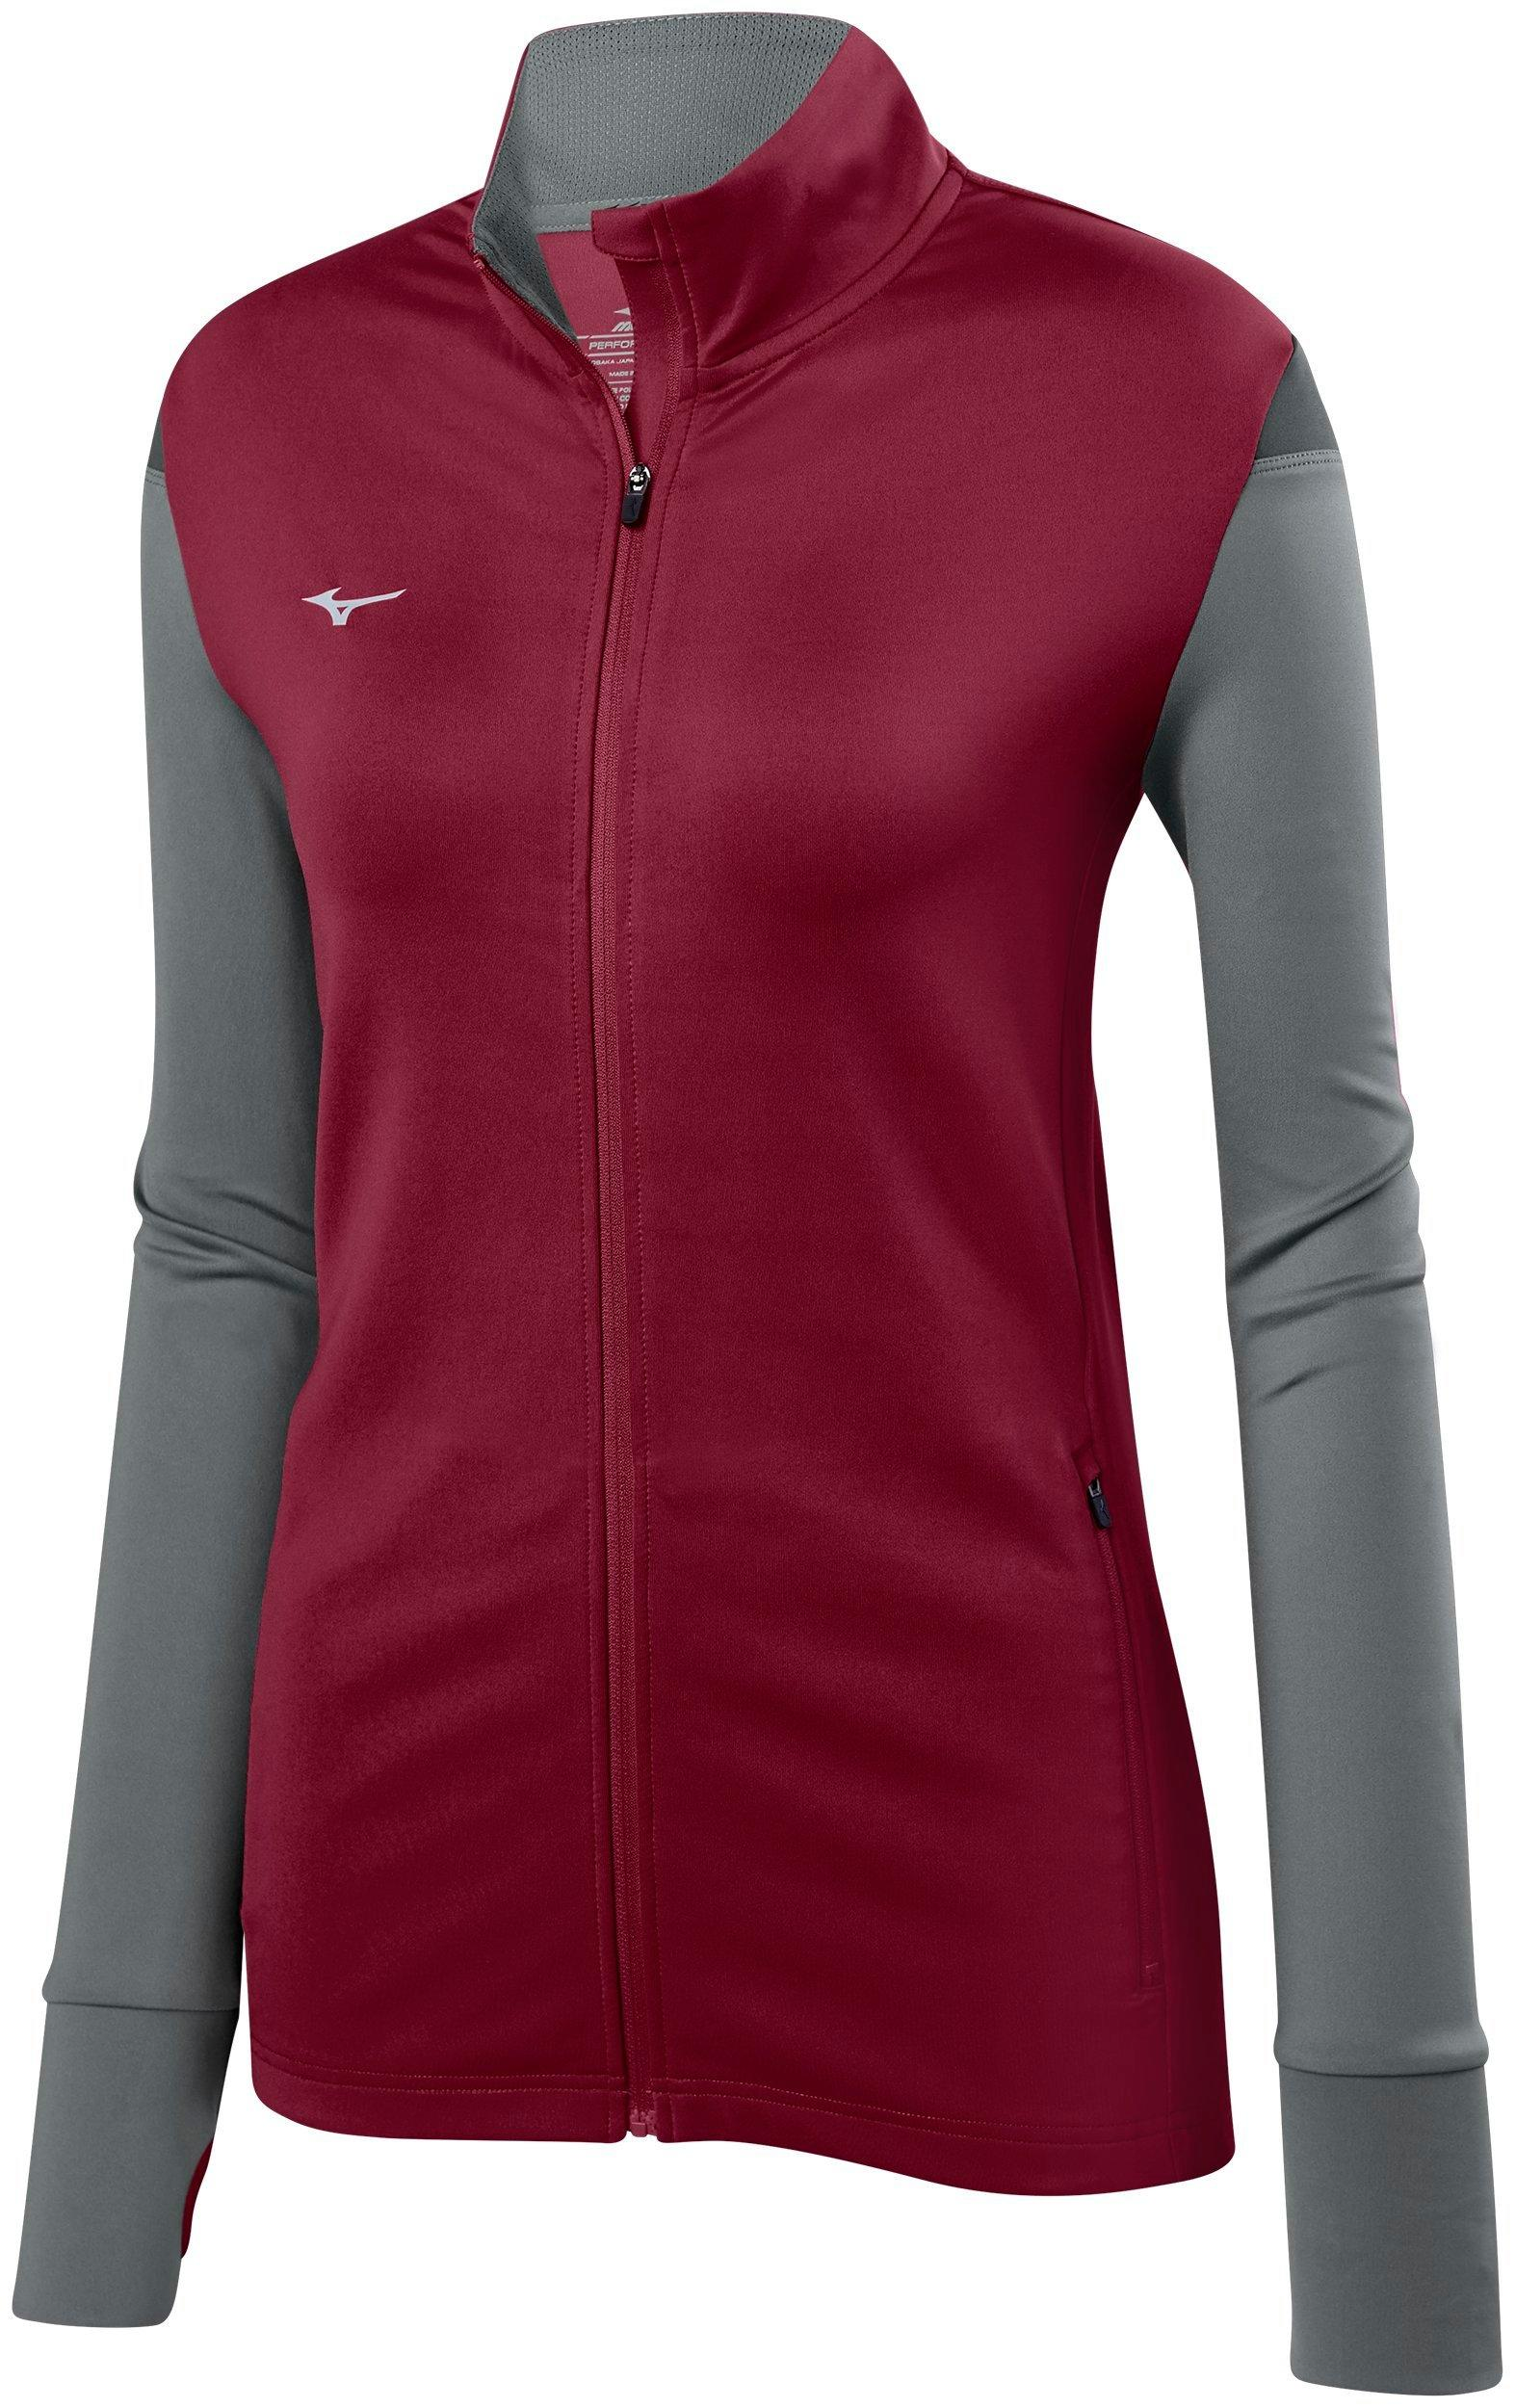 Mizuno Womens Volleyball Apparel Horizon Full Zip Volleyball Jacket 440660 by Mizuno